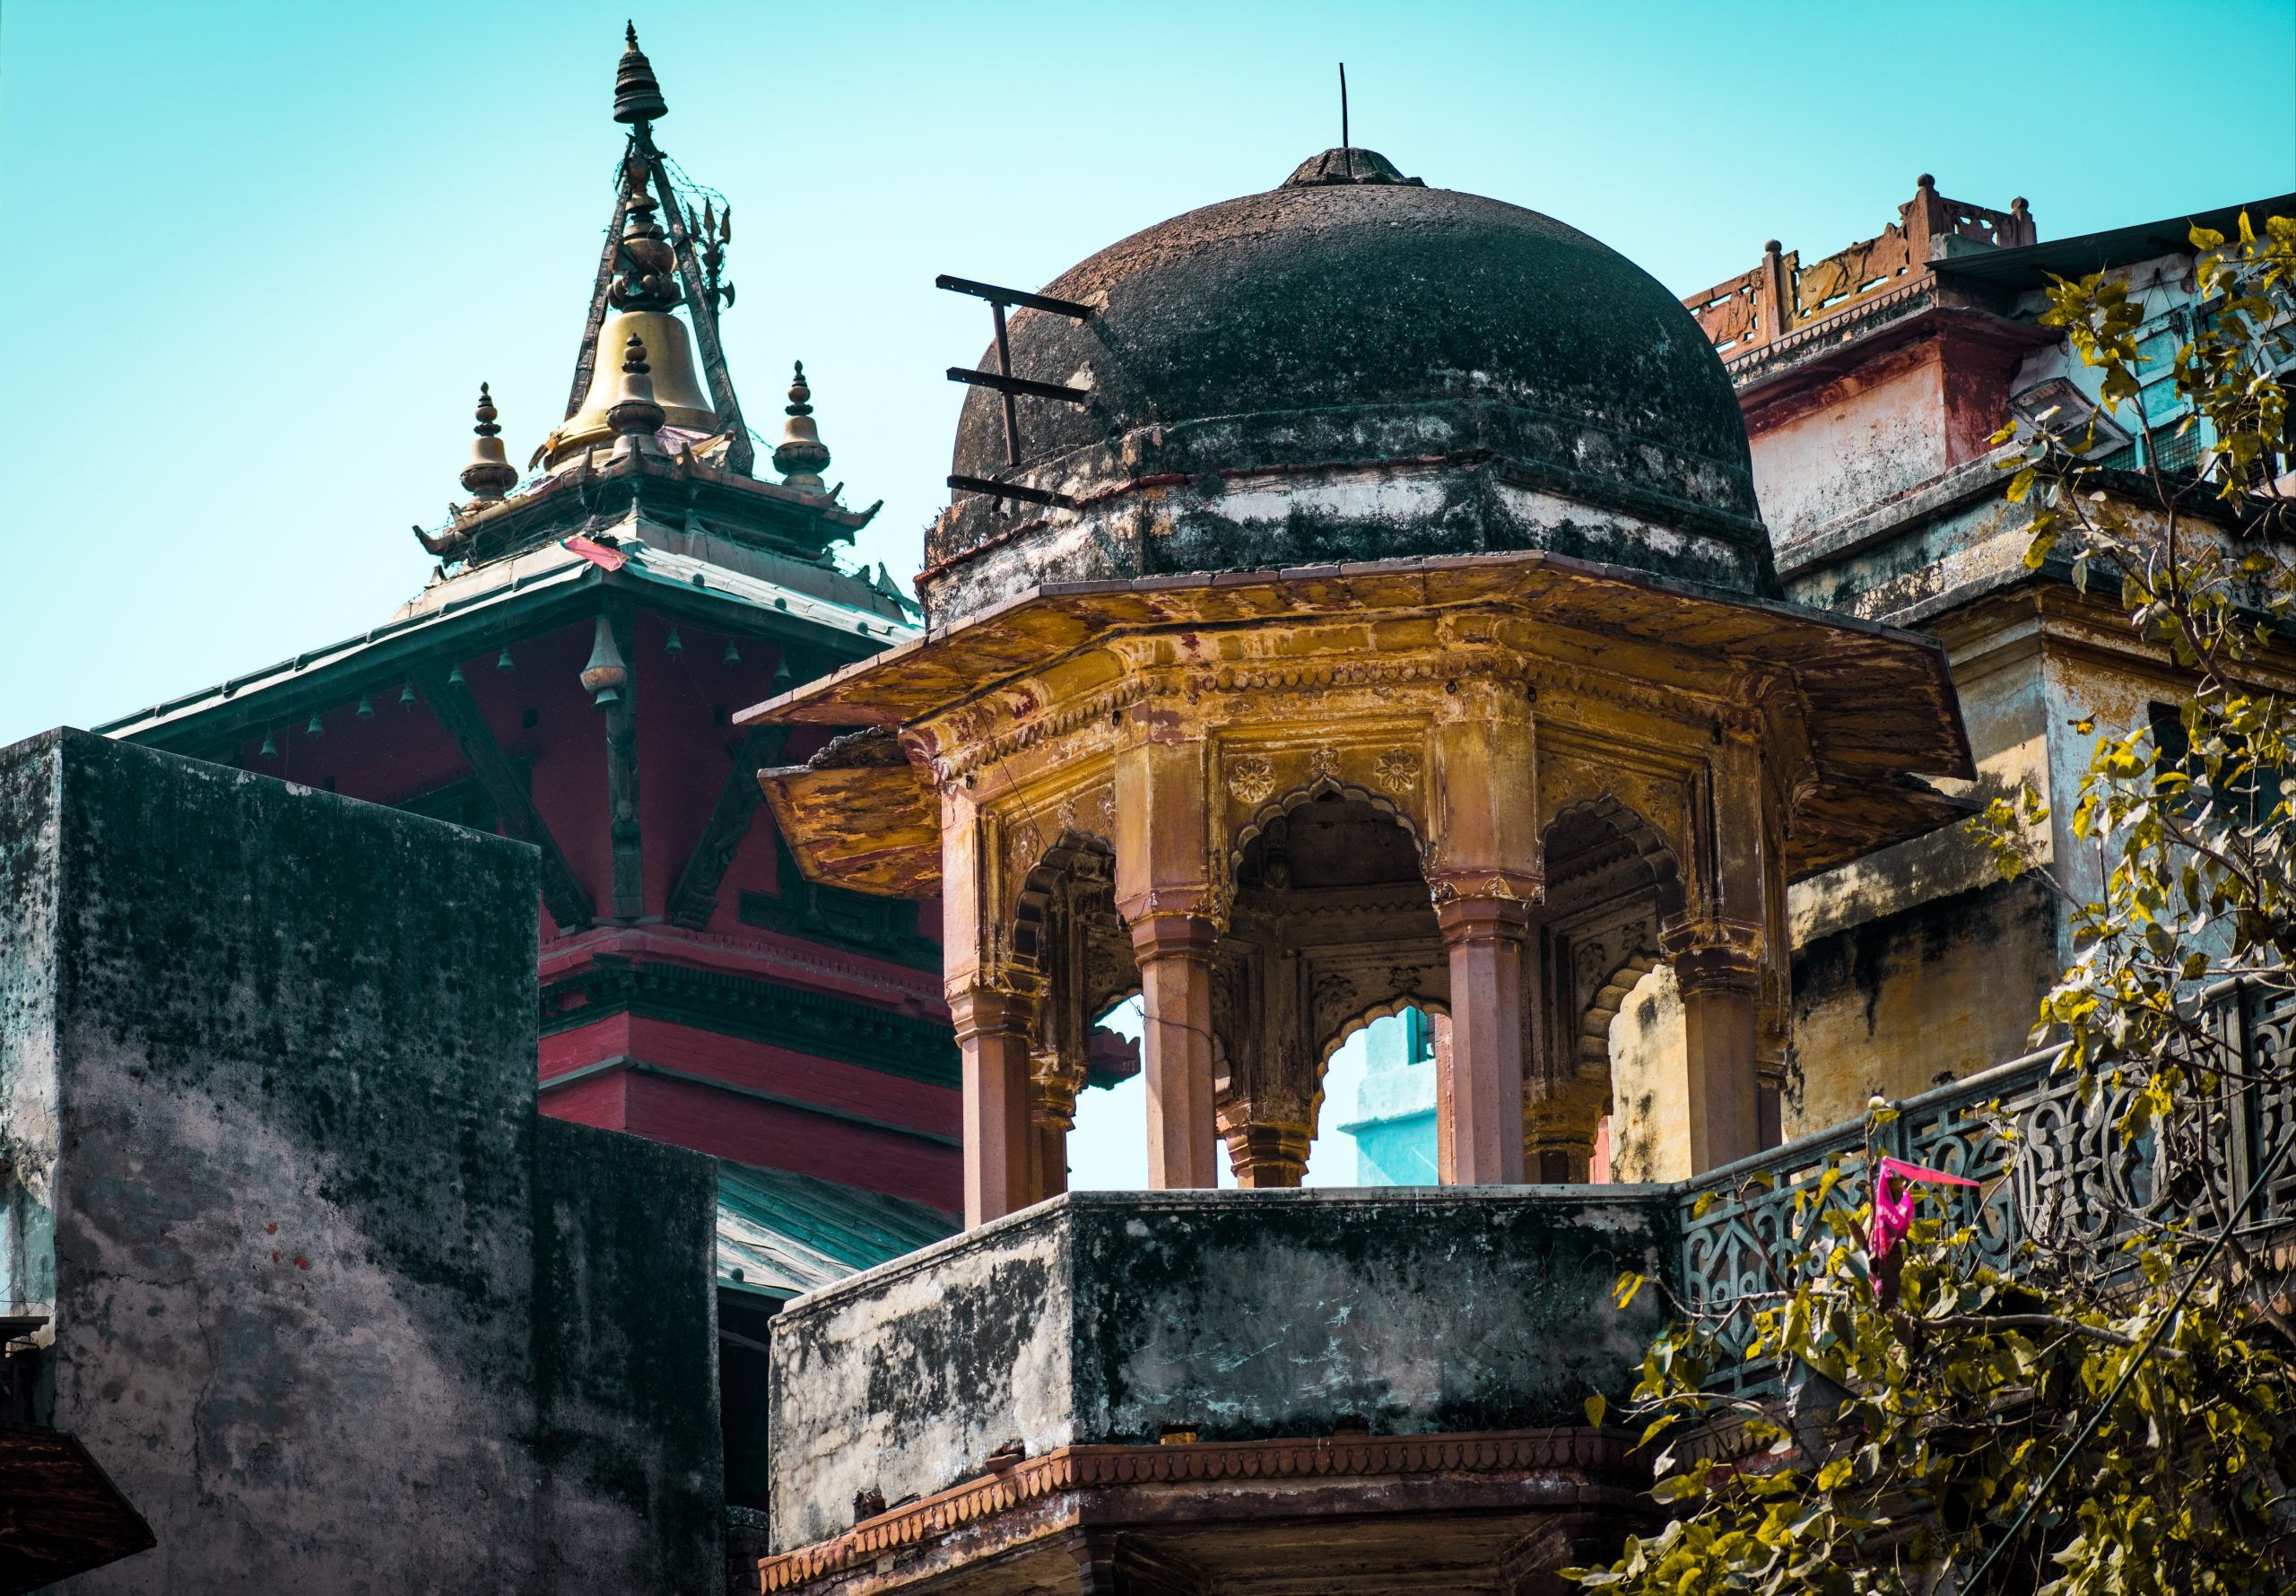 Dome architecture of a temple